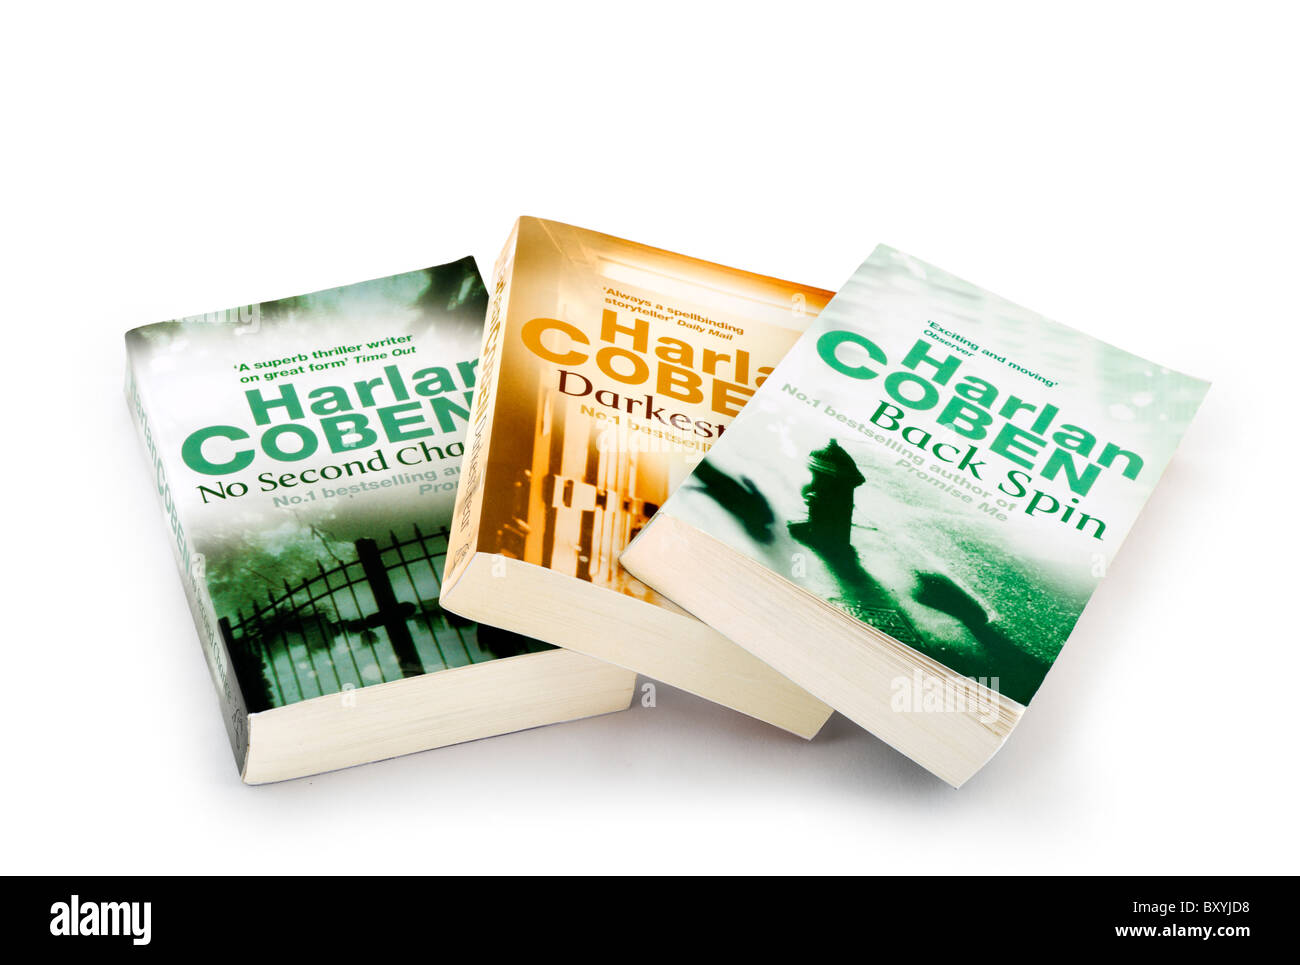 Best selling paperback books by Harlan Coben, UK - Stock Image